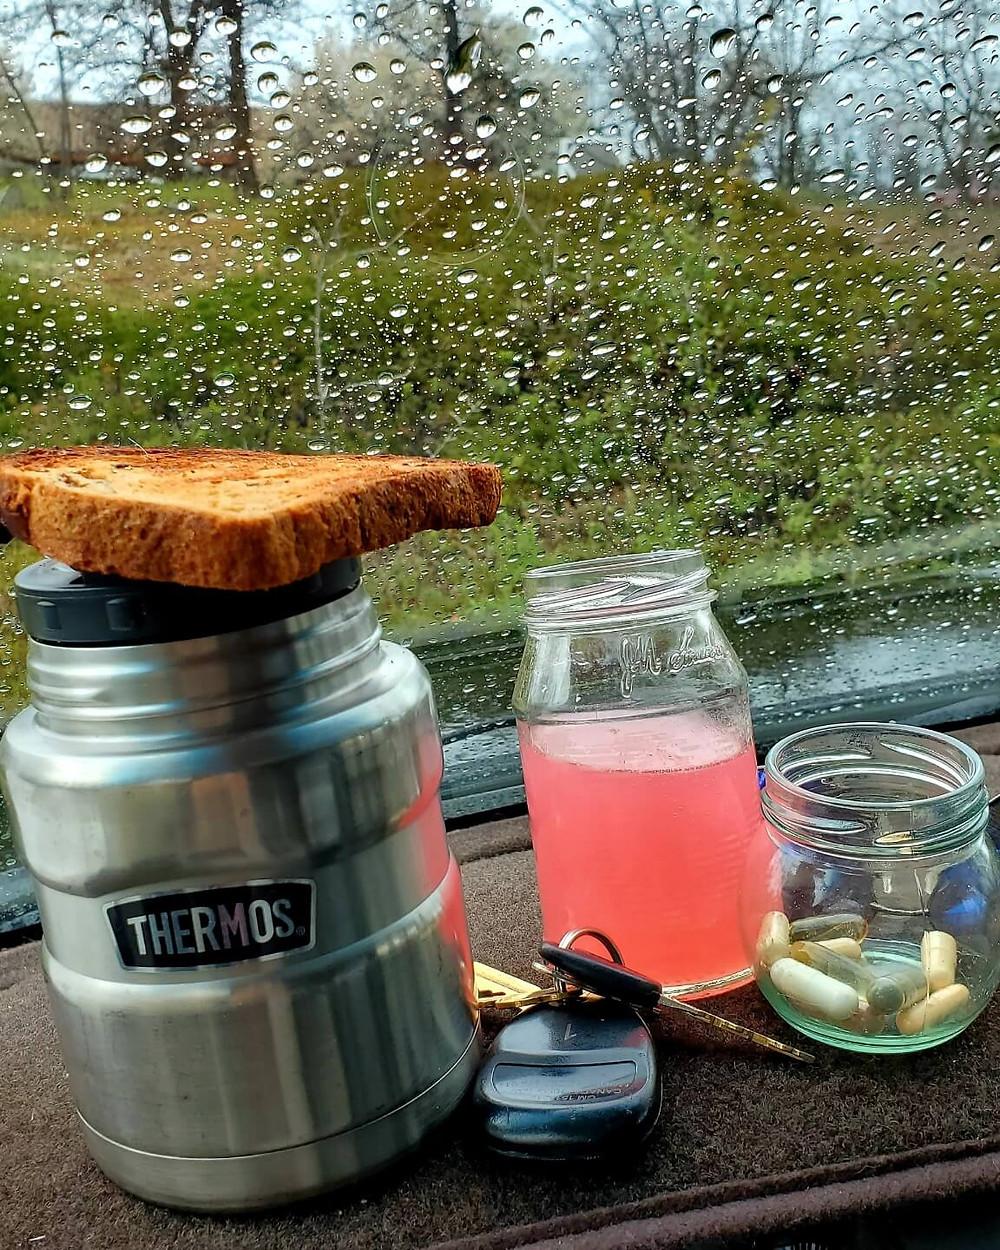 Food drink and vitamins on vehicle dashboard